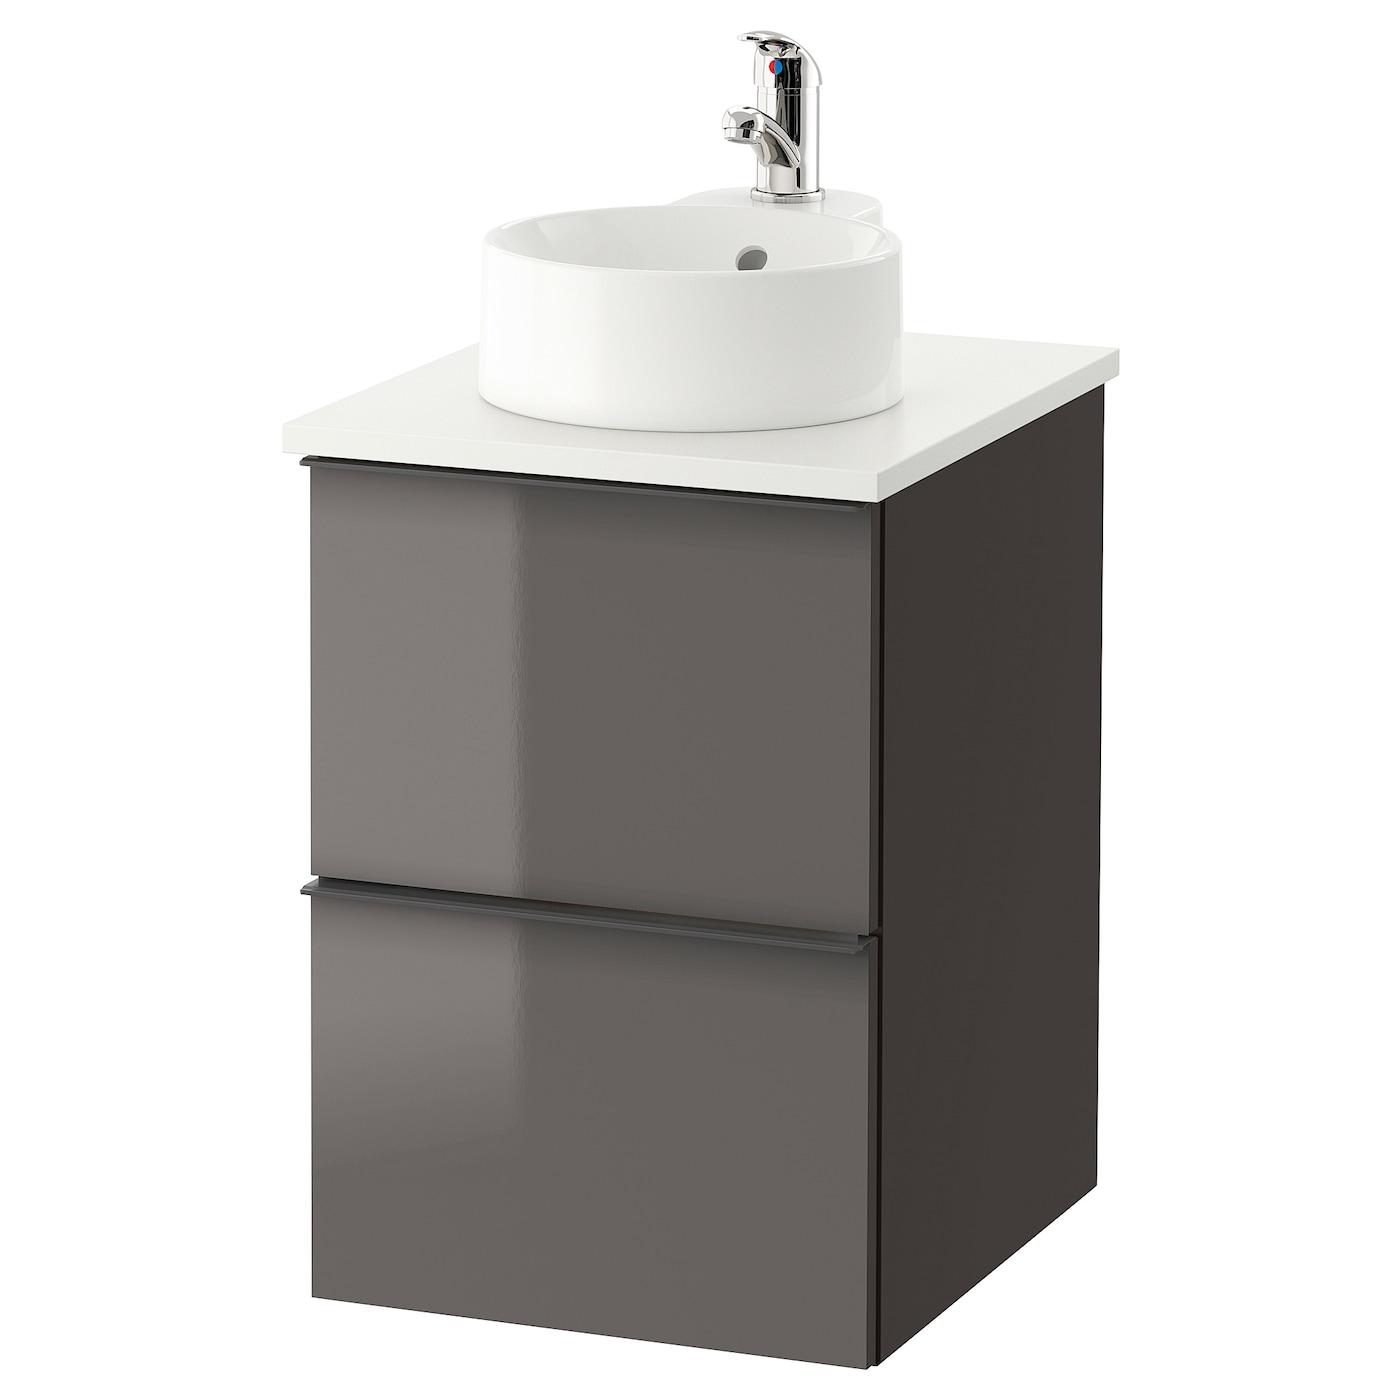 Gutviken godmorgon tolken wsh stnd w countertop 29 wash for Evier salle de bain ikea